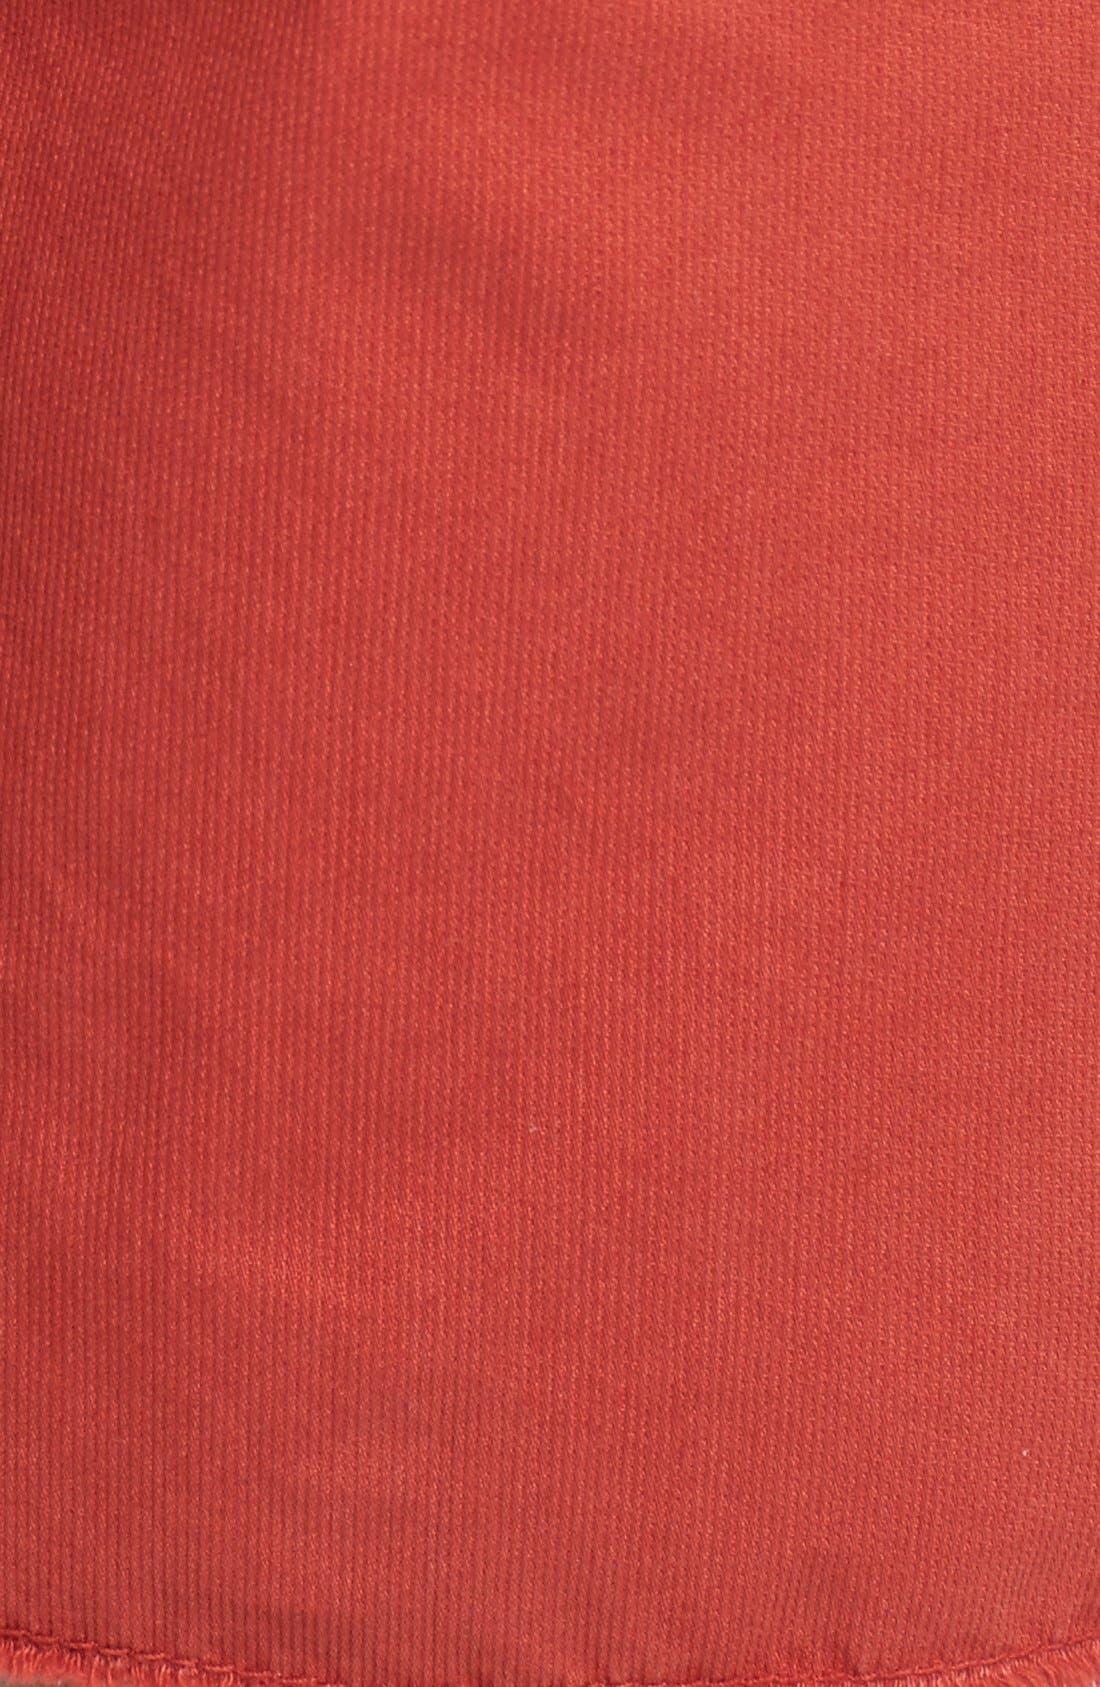 'St. Barts' Raw Edge Shorts,                             Alternate thumbnail 5, color,                             801